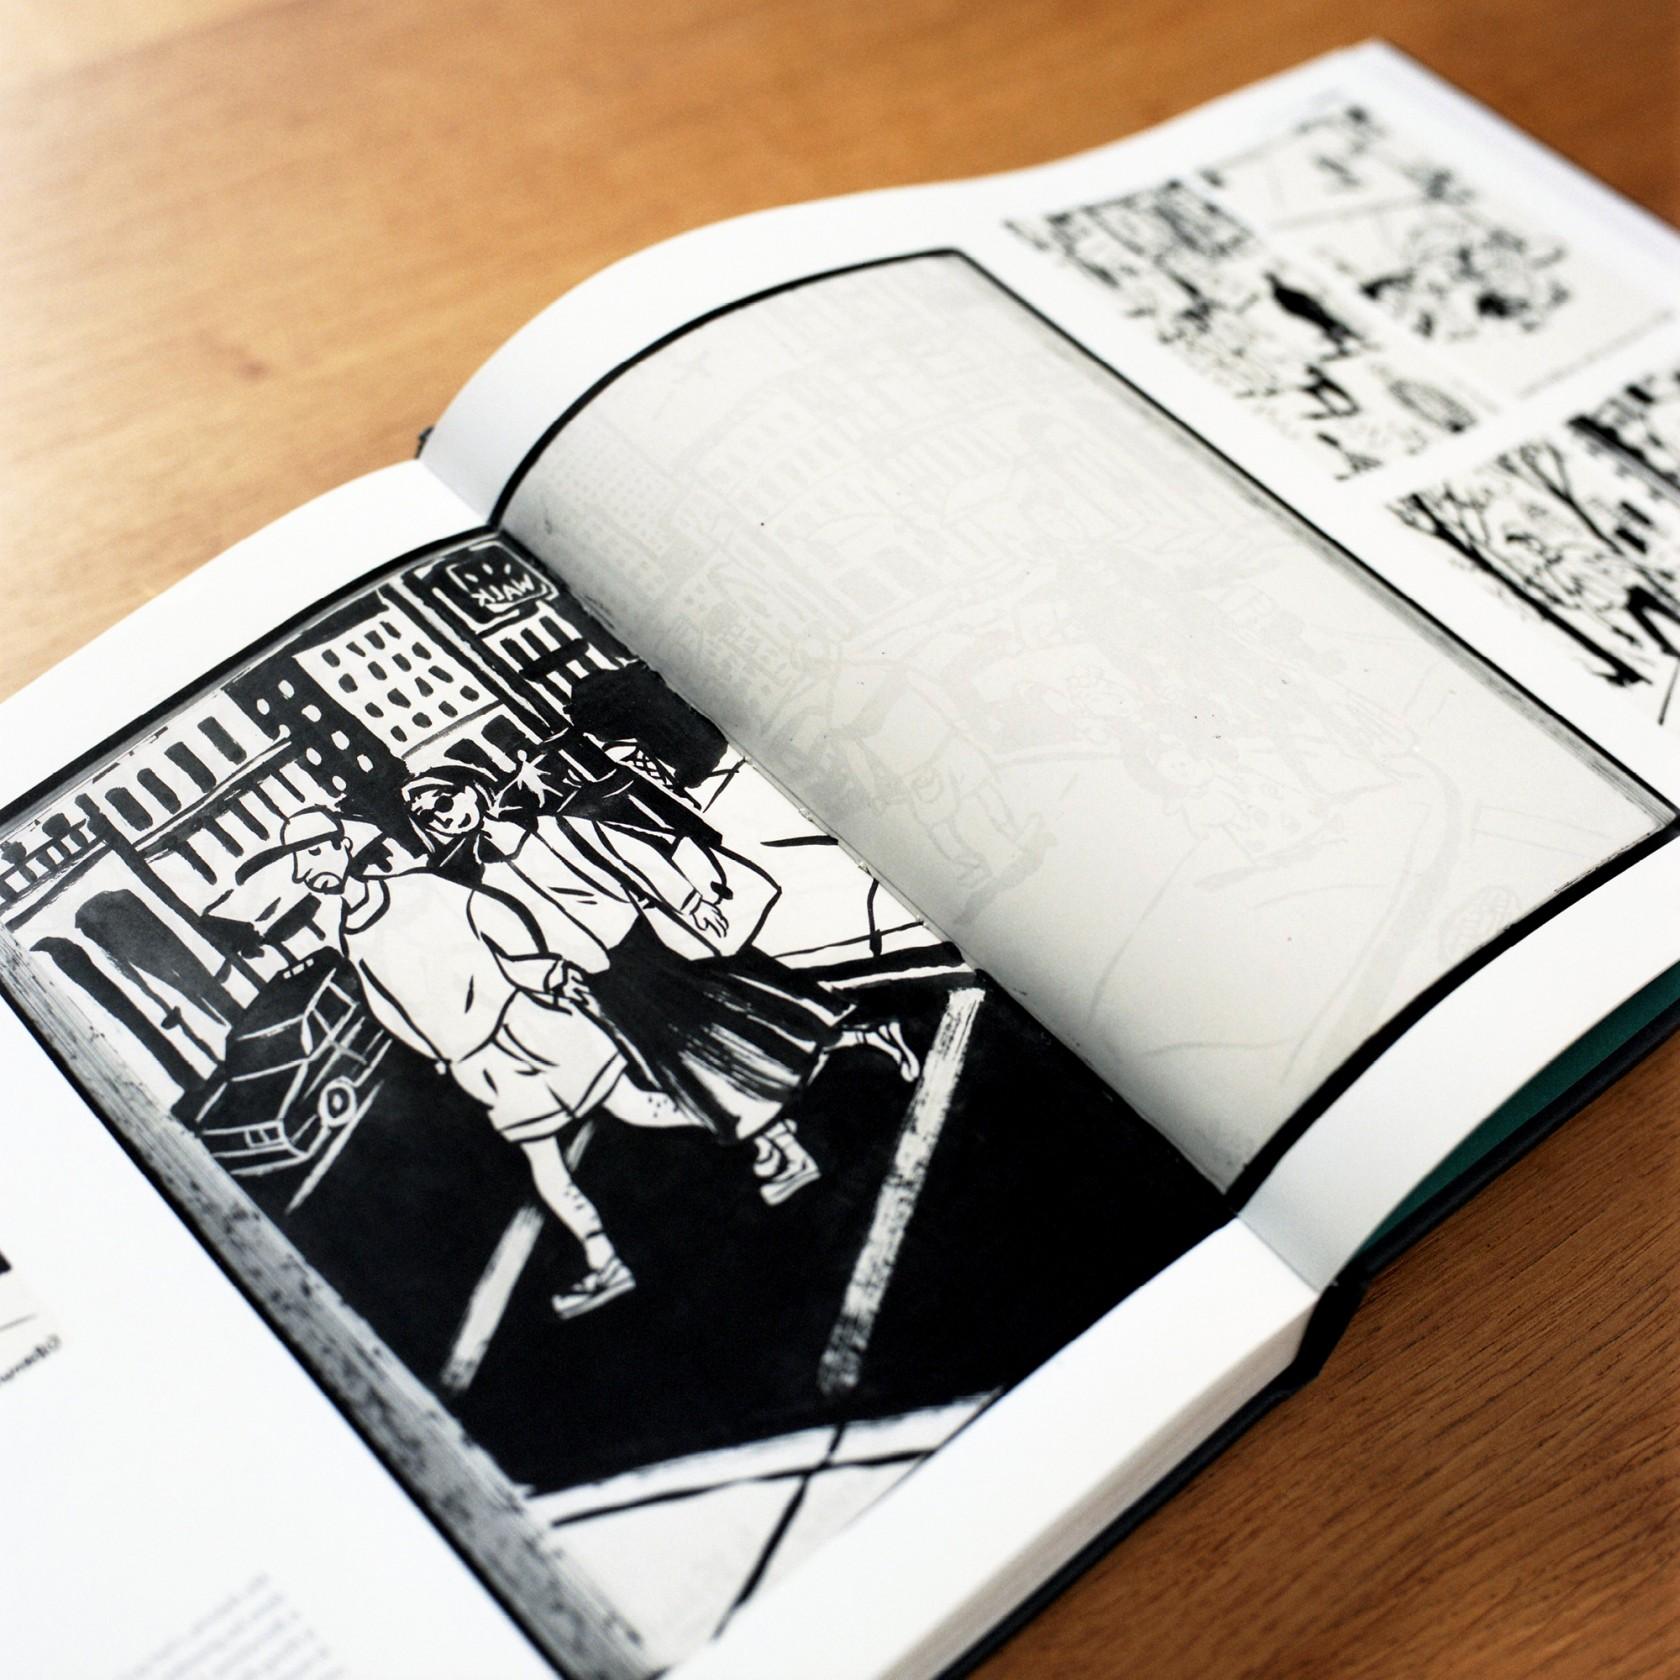 fouinzanardi -  fz_print.books_editionsduchene17